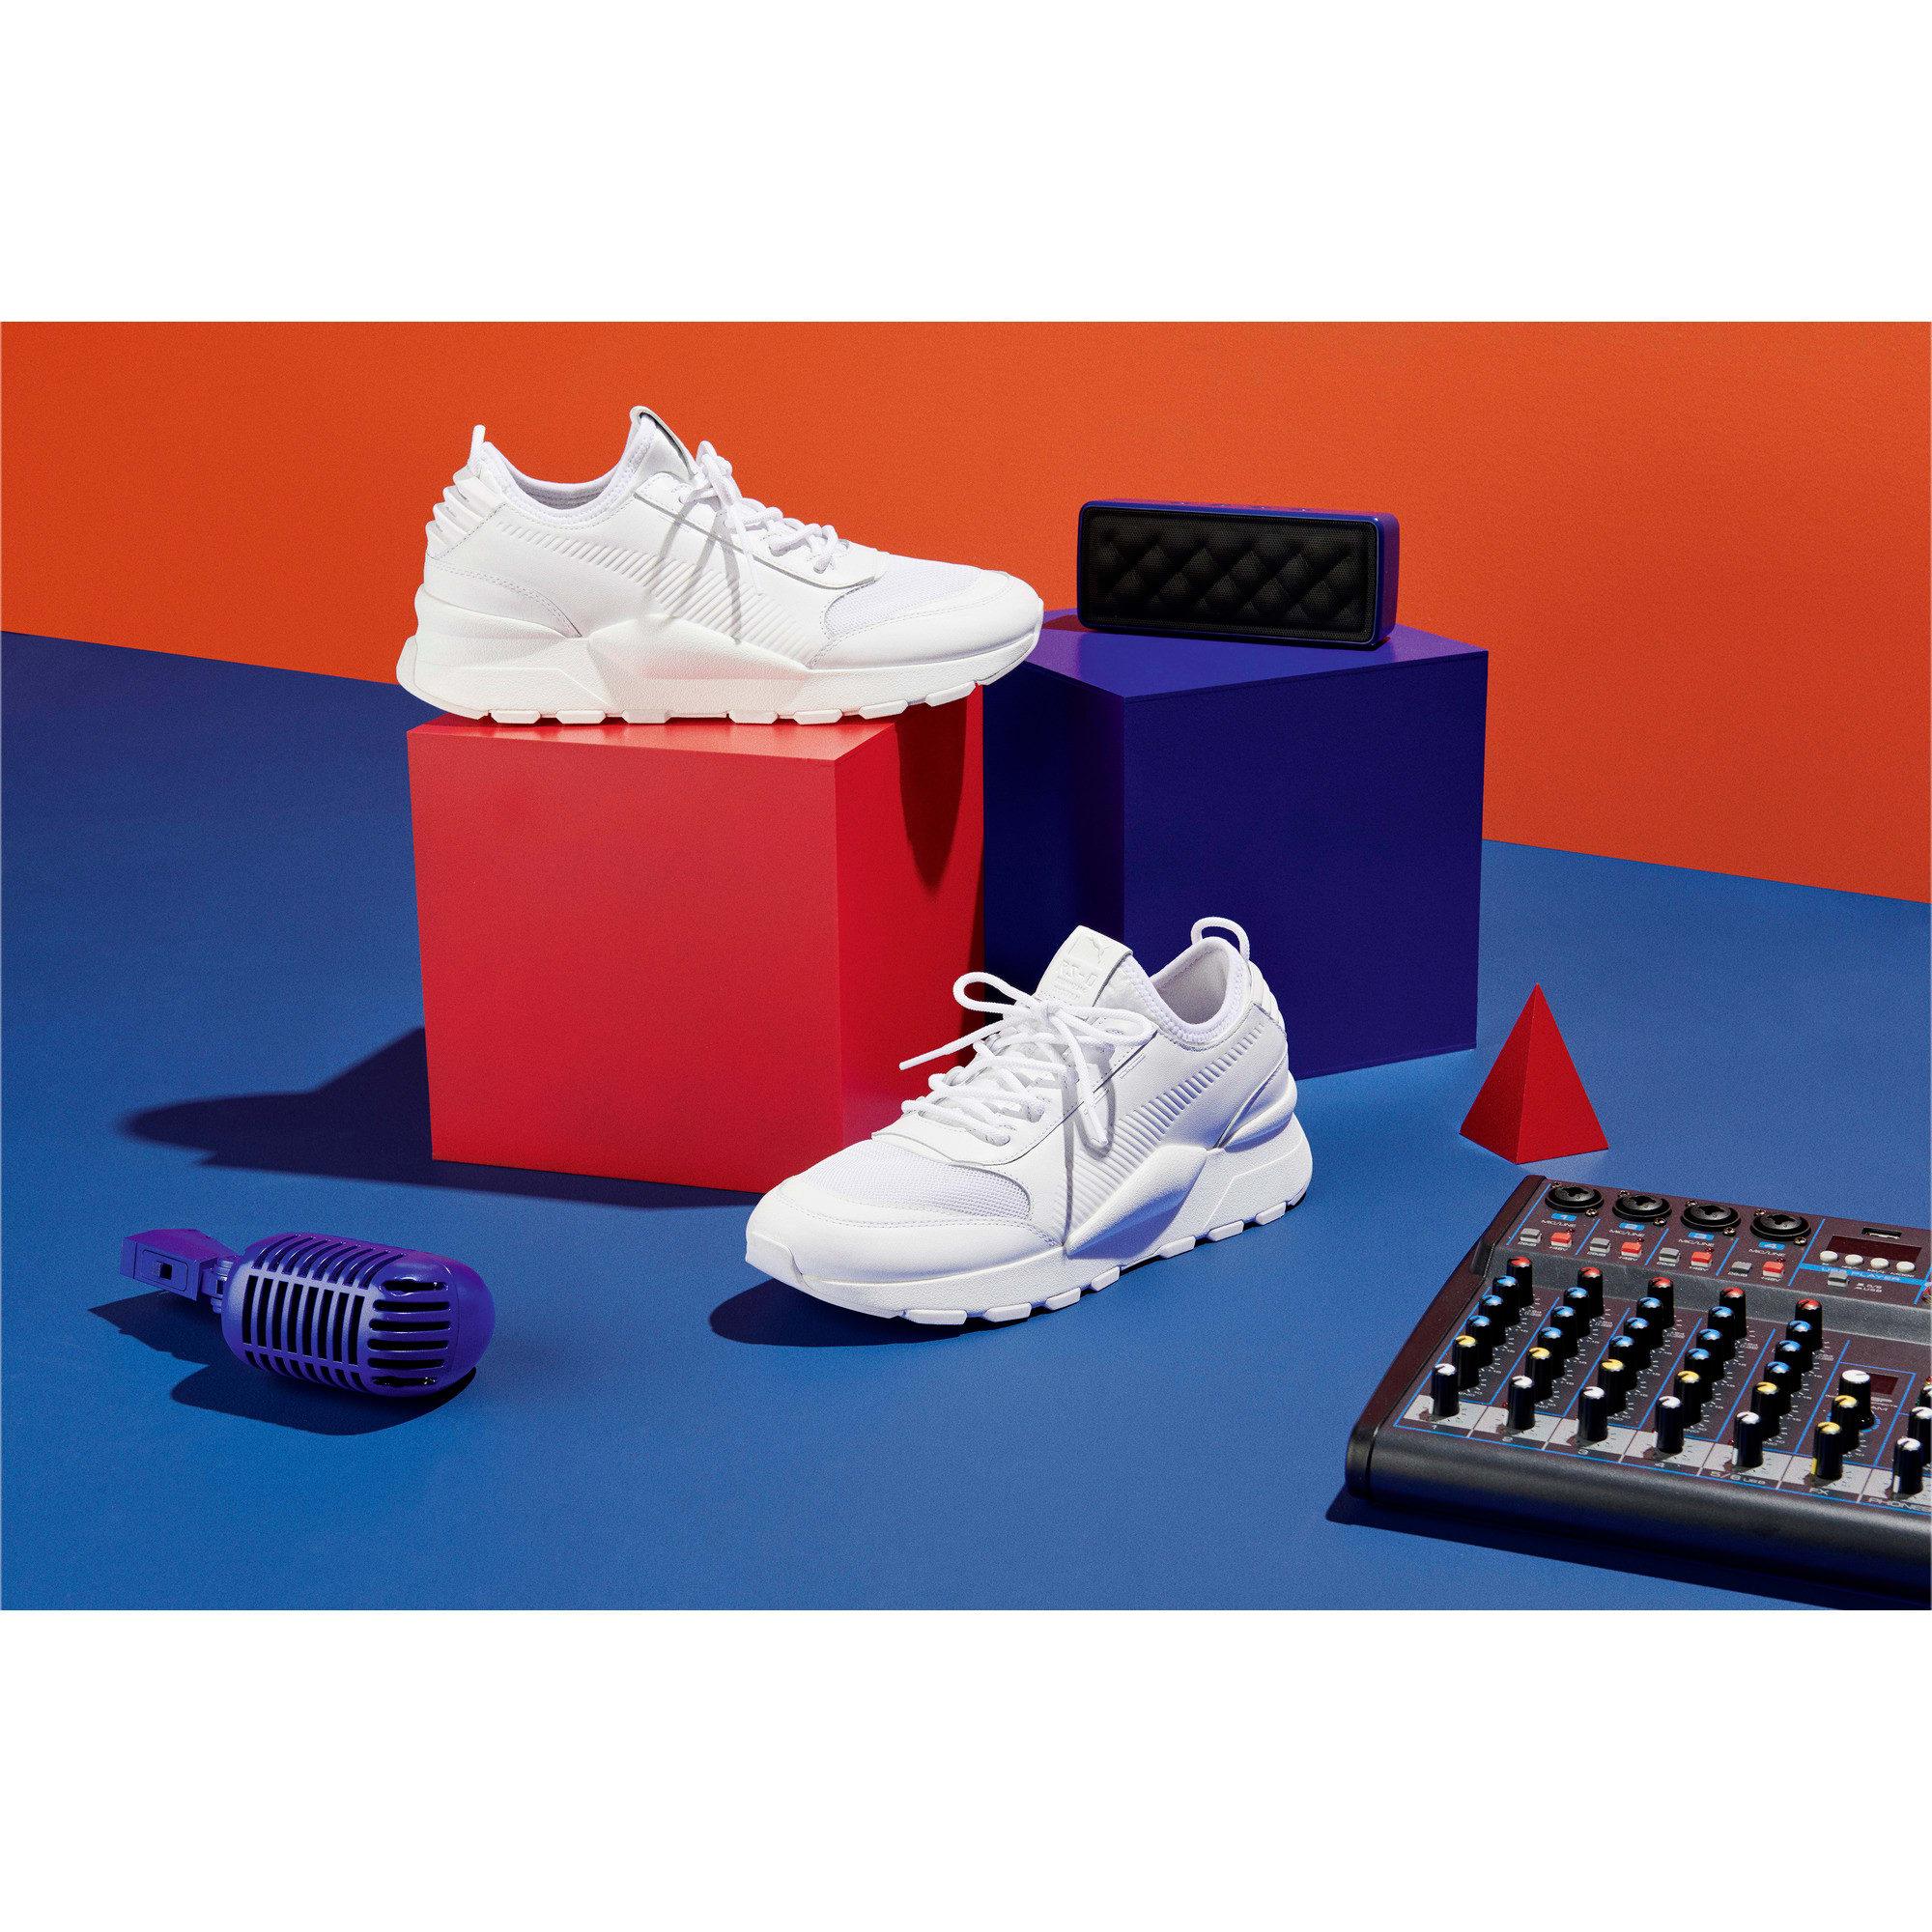 Thumbnail 7 of Evolution RS-0 SOUND sneakers, Puma White, medium